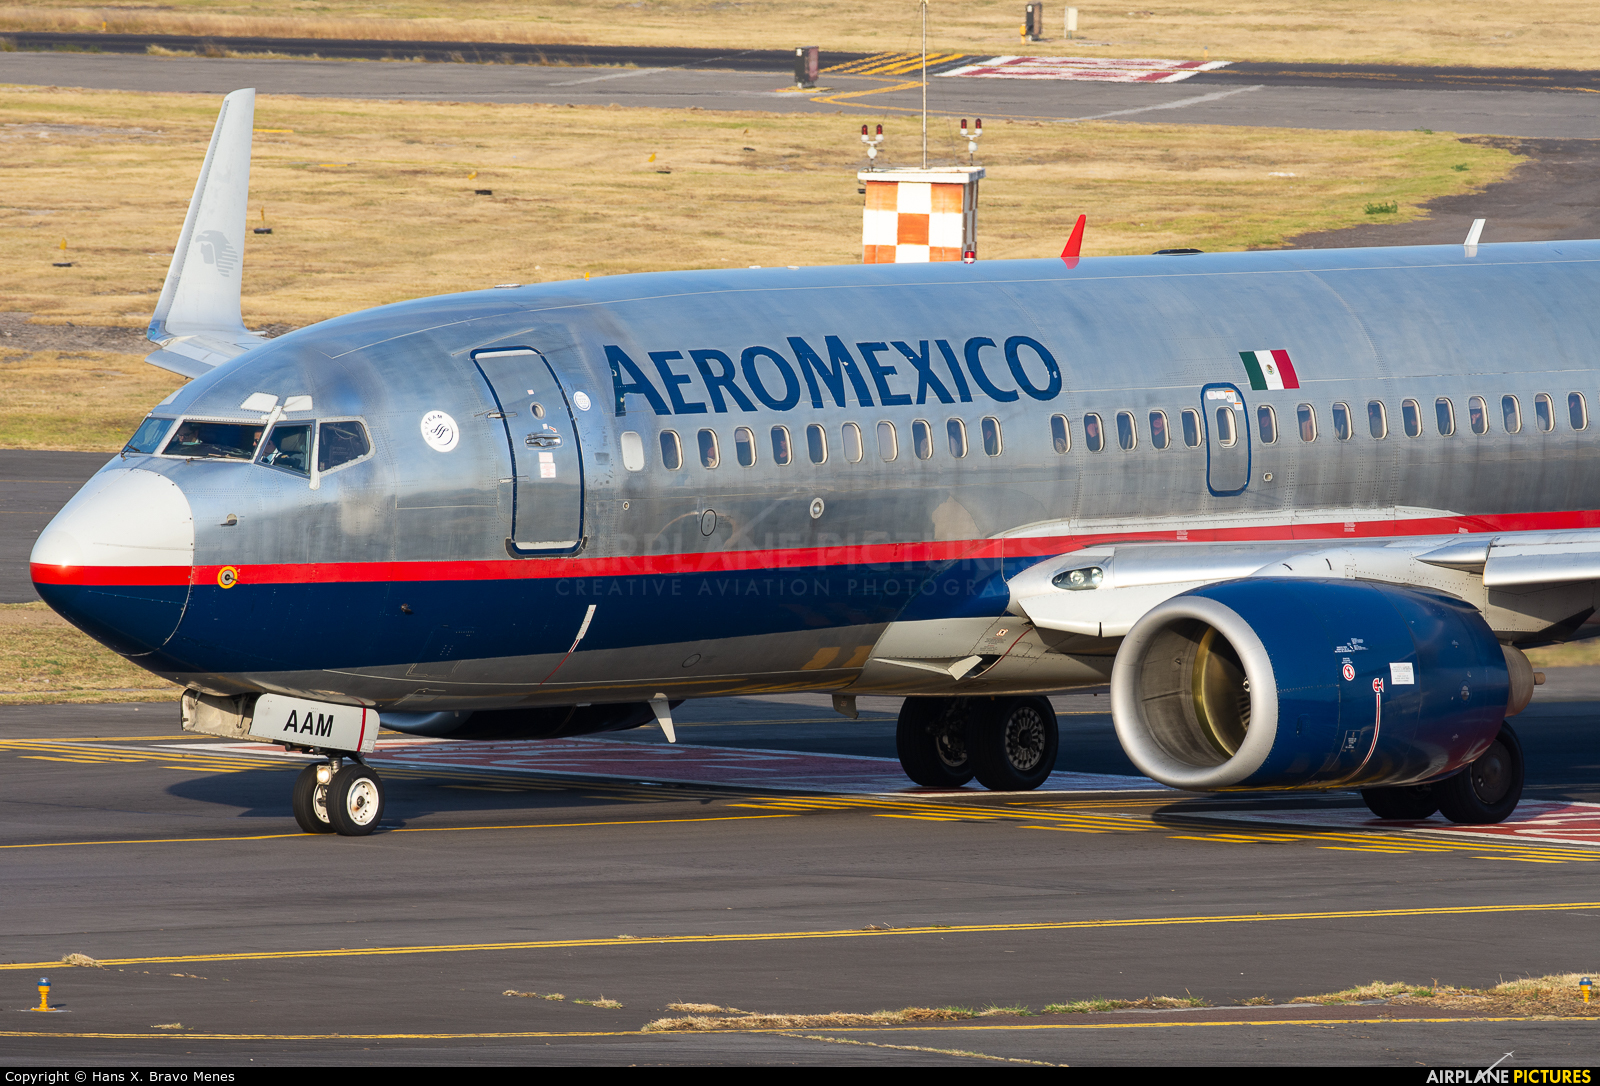 XA-DRD - Aeromexico Boeing 737-700 at Mexico City